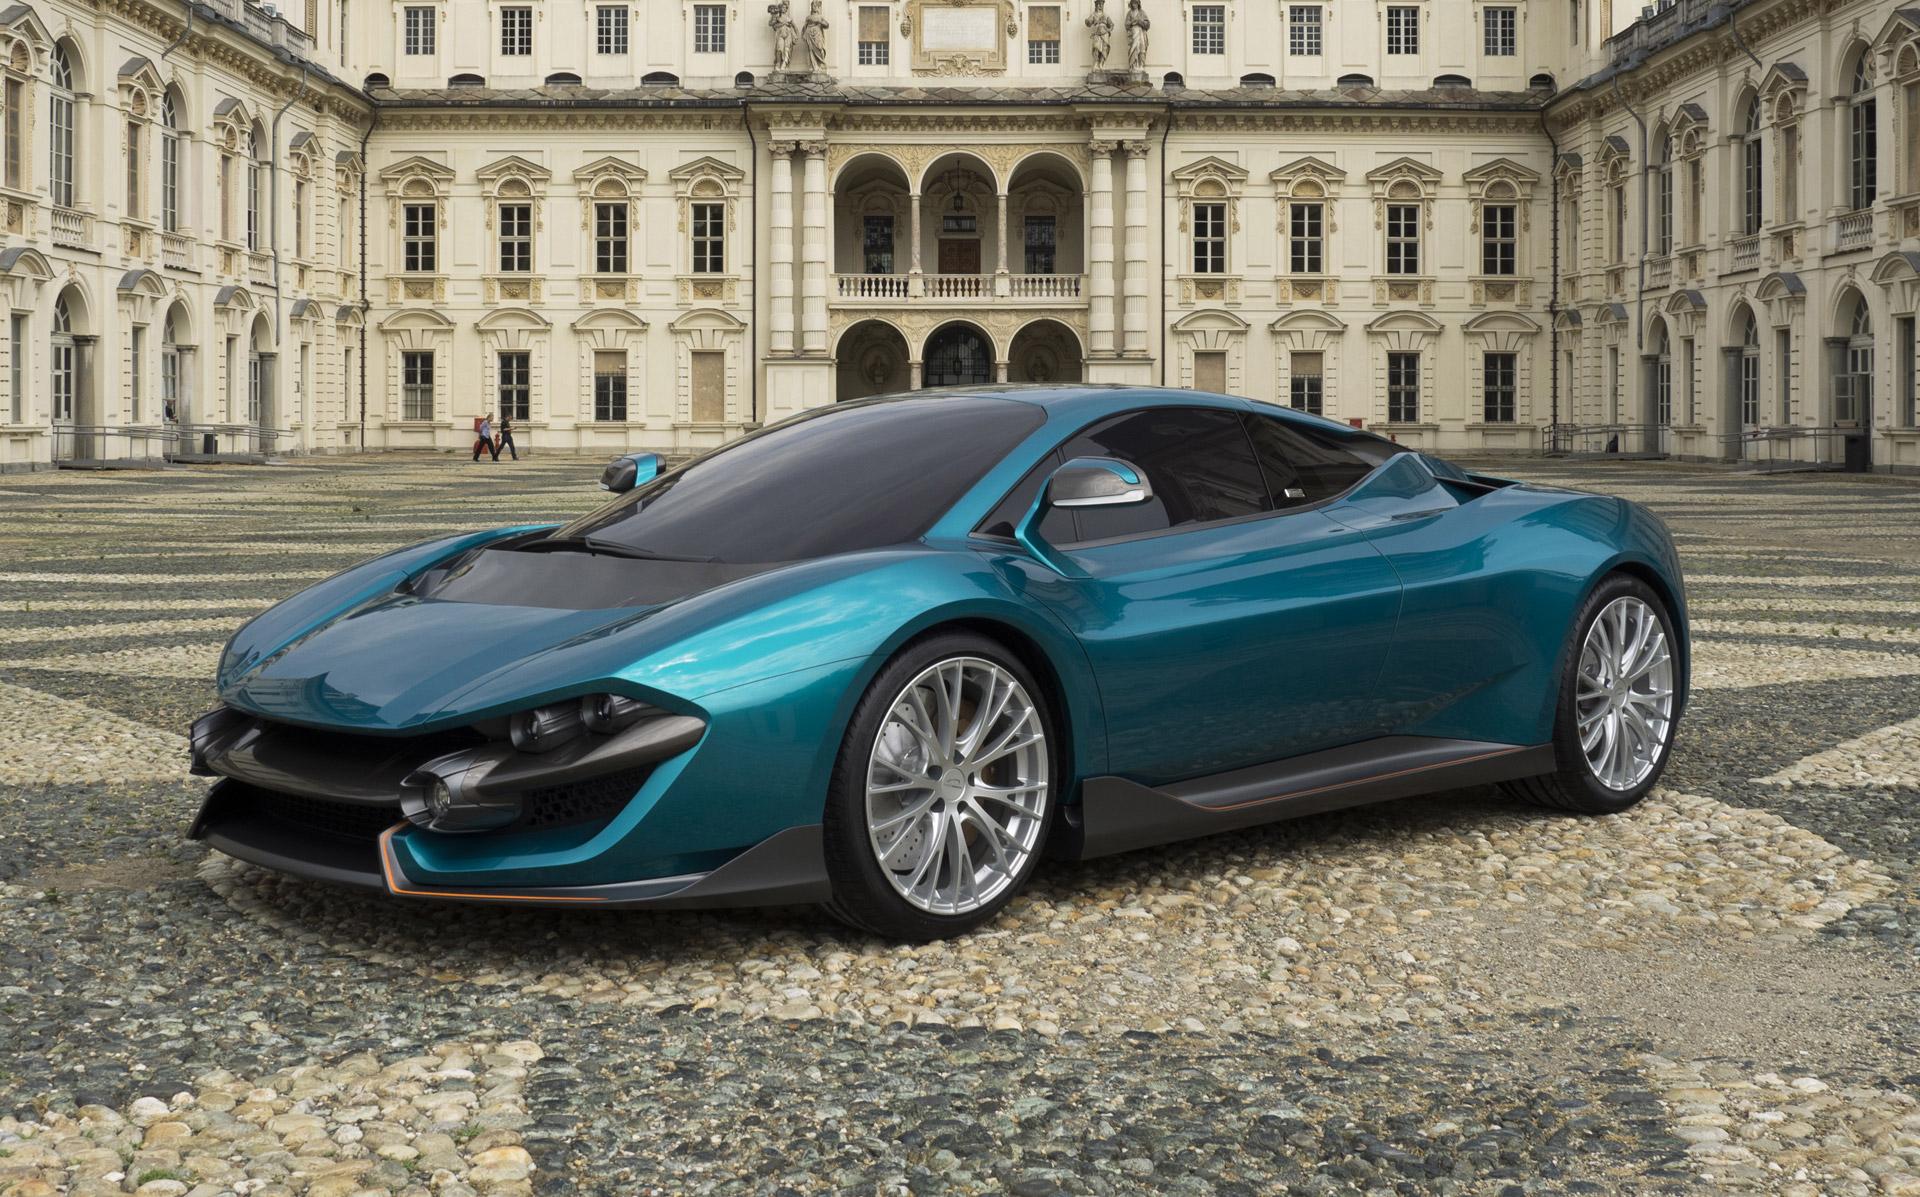 Italy's Torino Design Unveils Wildtwelve Hybrid Supercar Concept